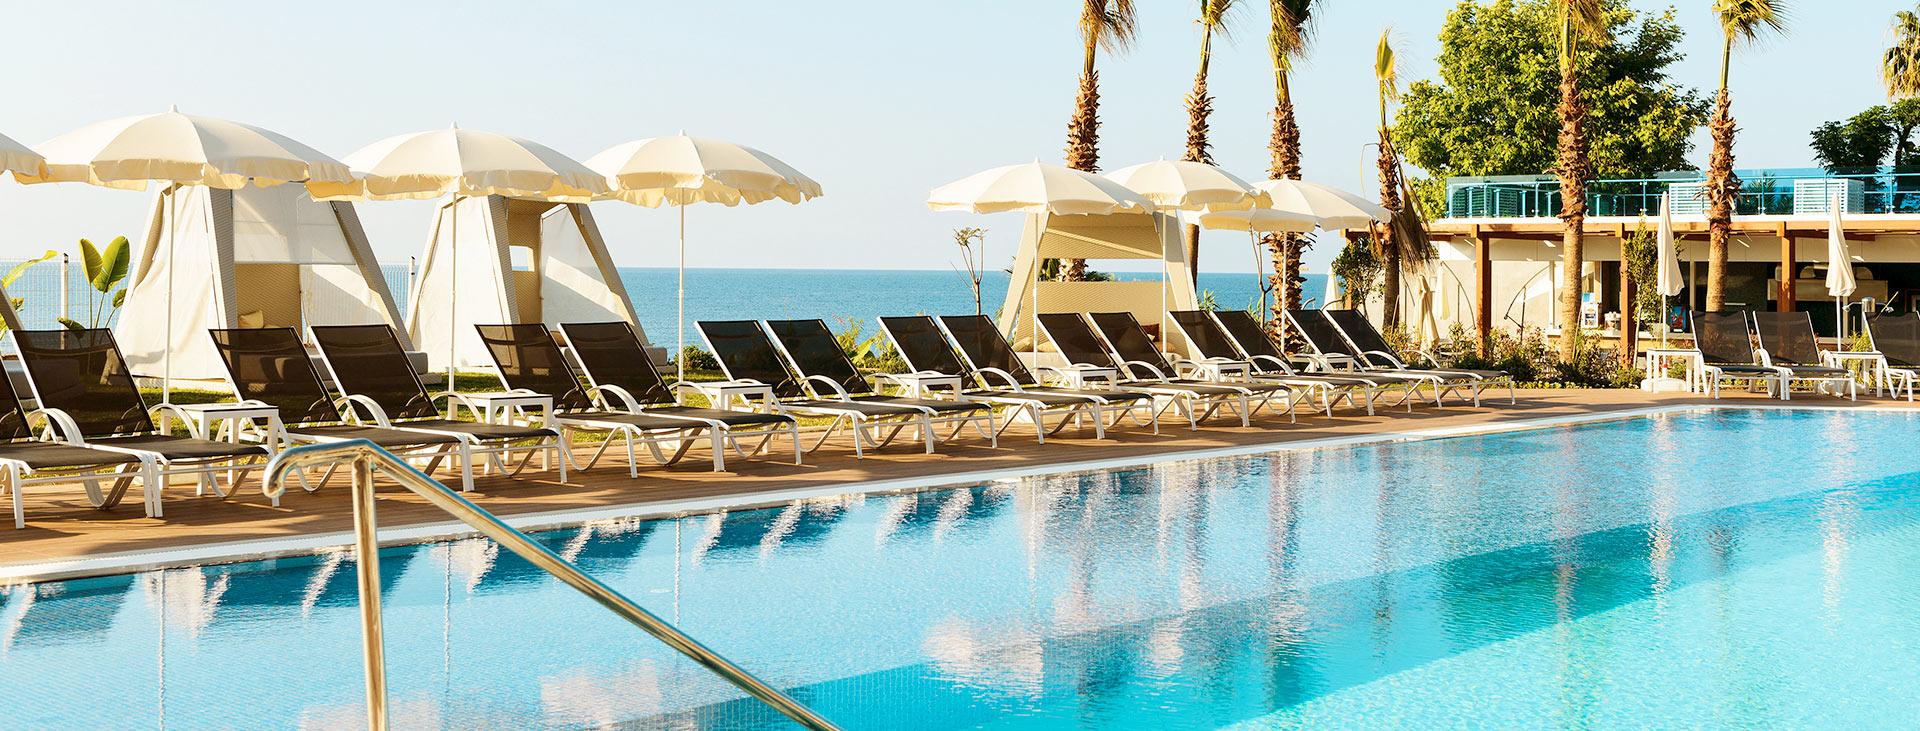 Sunprime Numa Beach, Alanya, Antalya-området, Turkiet